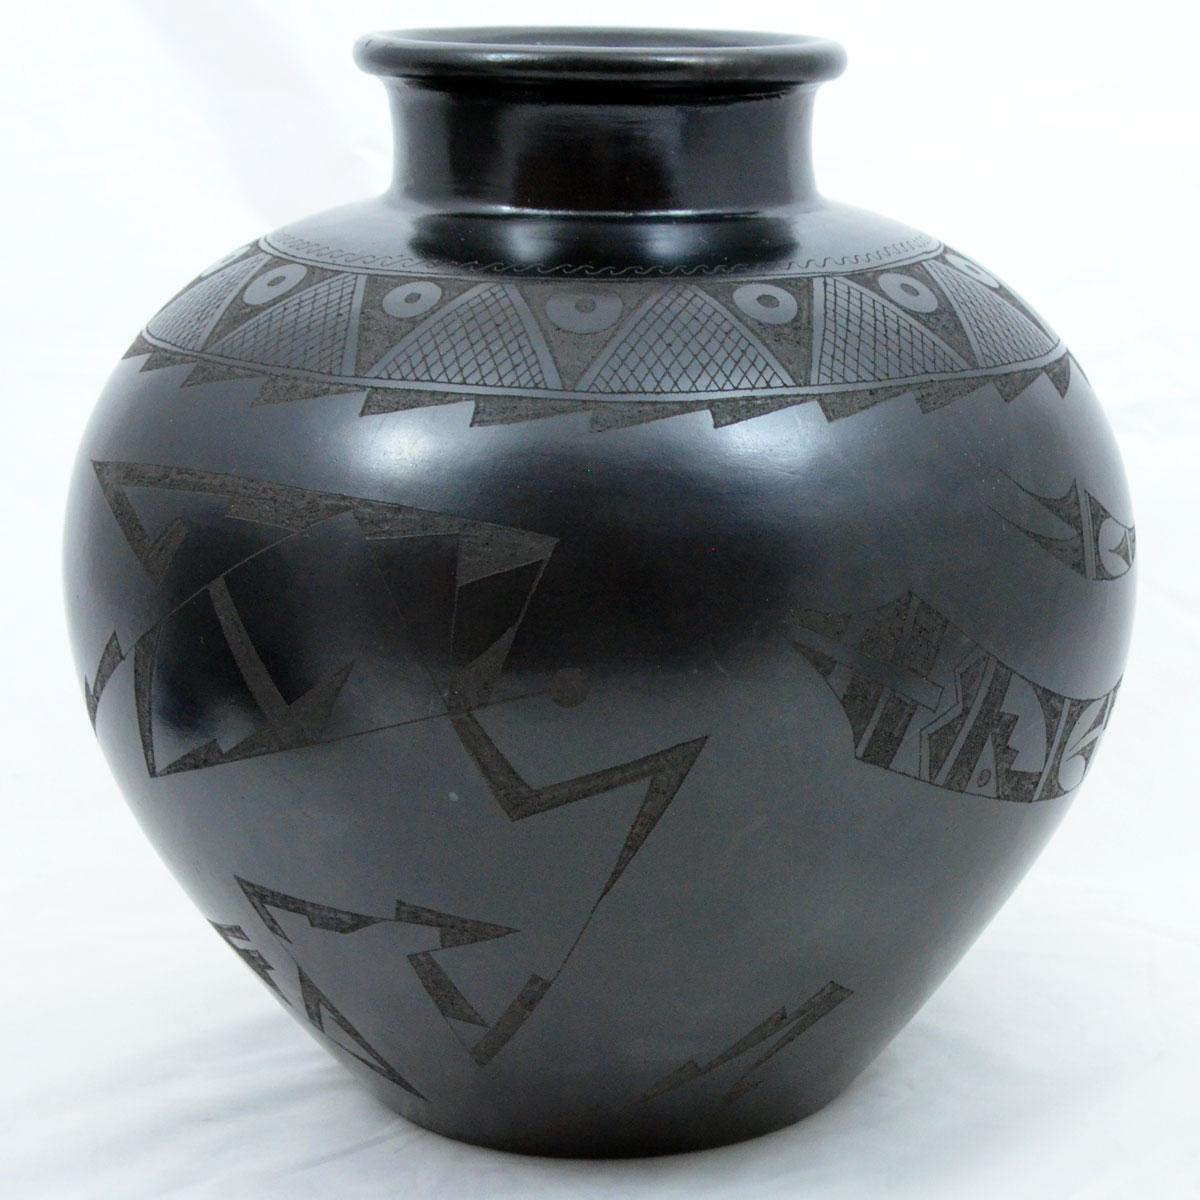 Rigoberto Mateos: Grande Barro Negro Large Pot